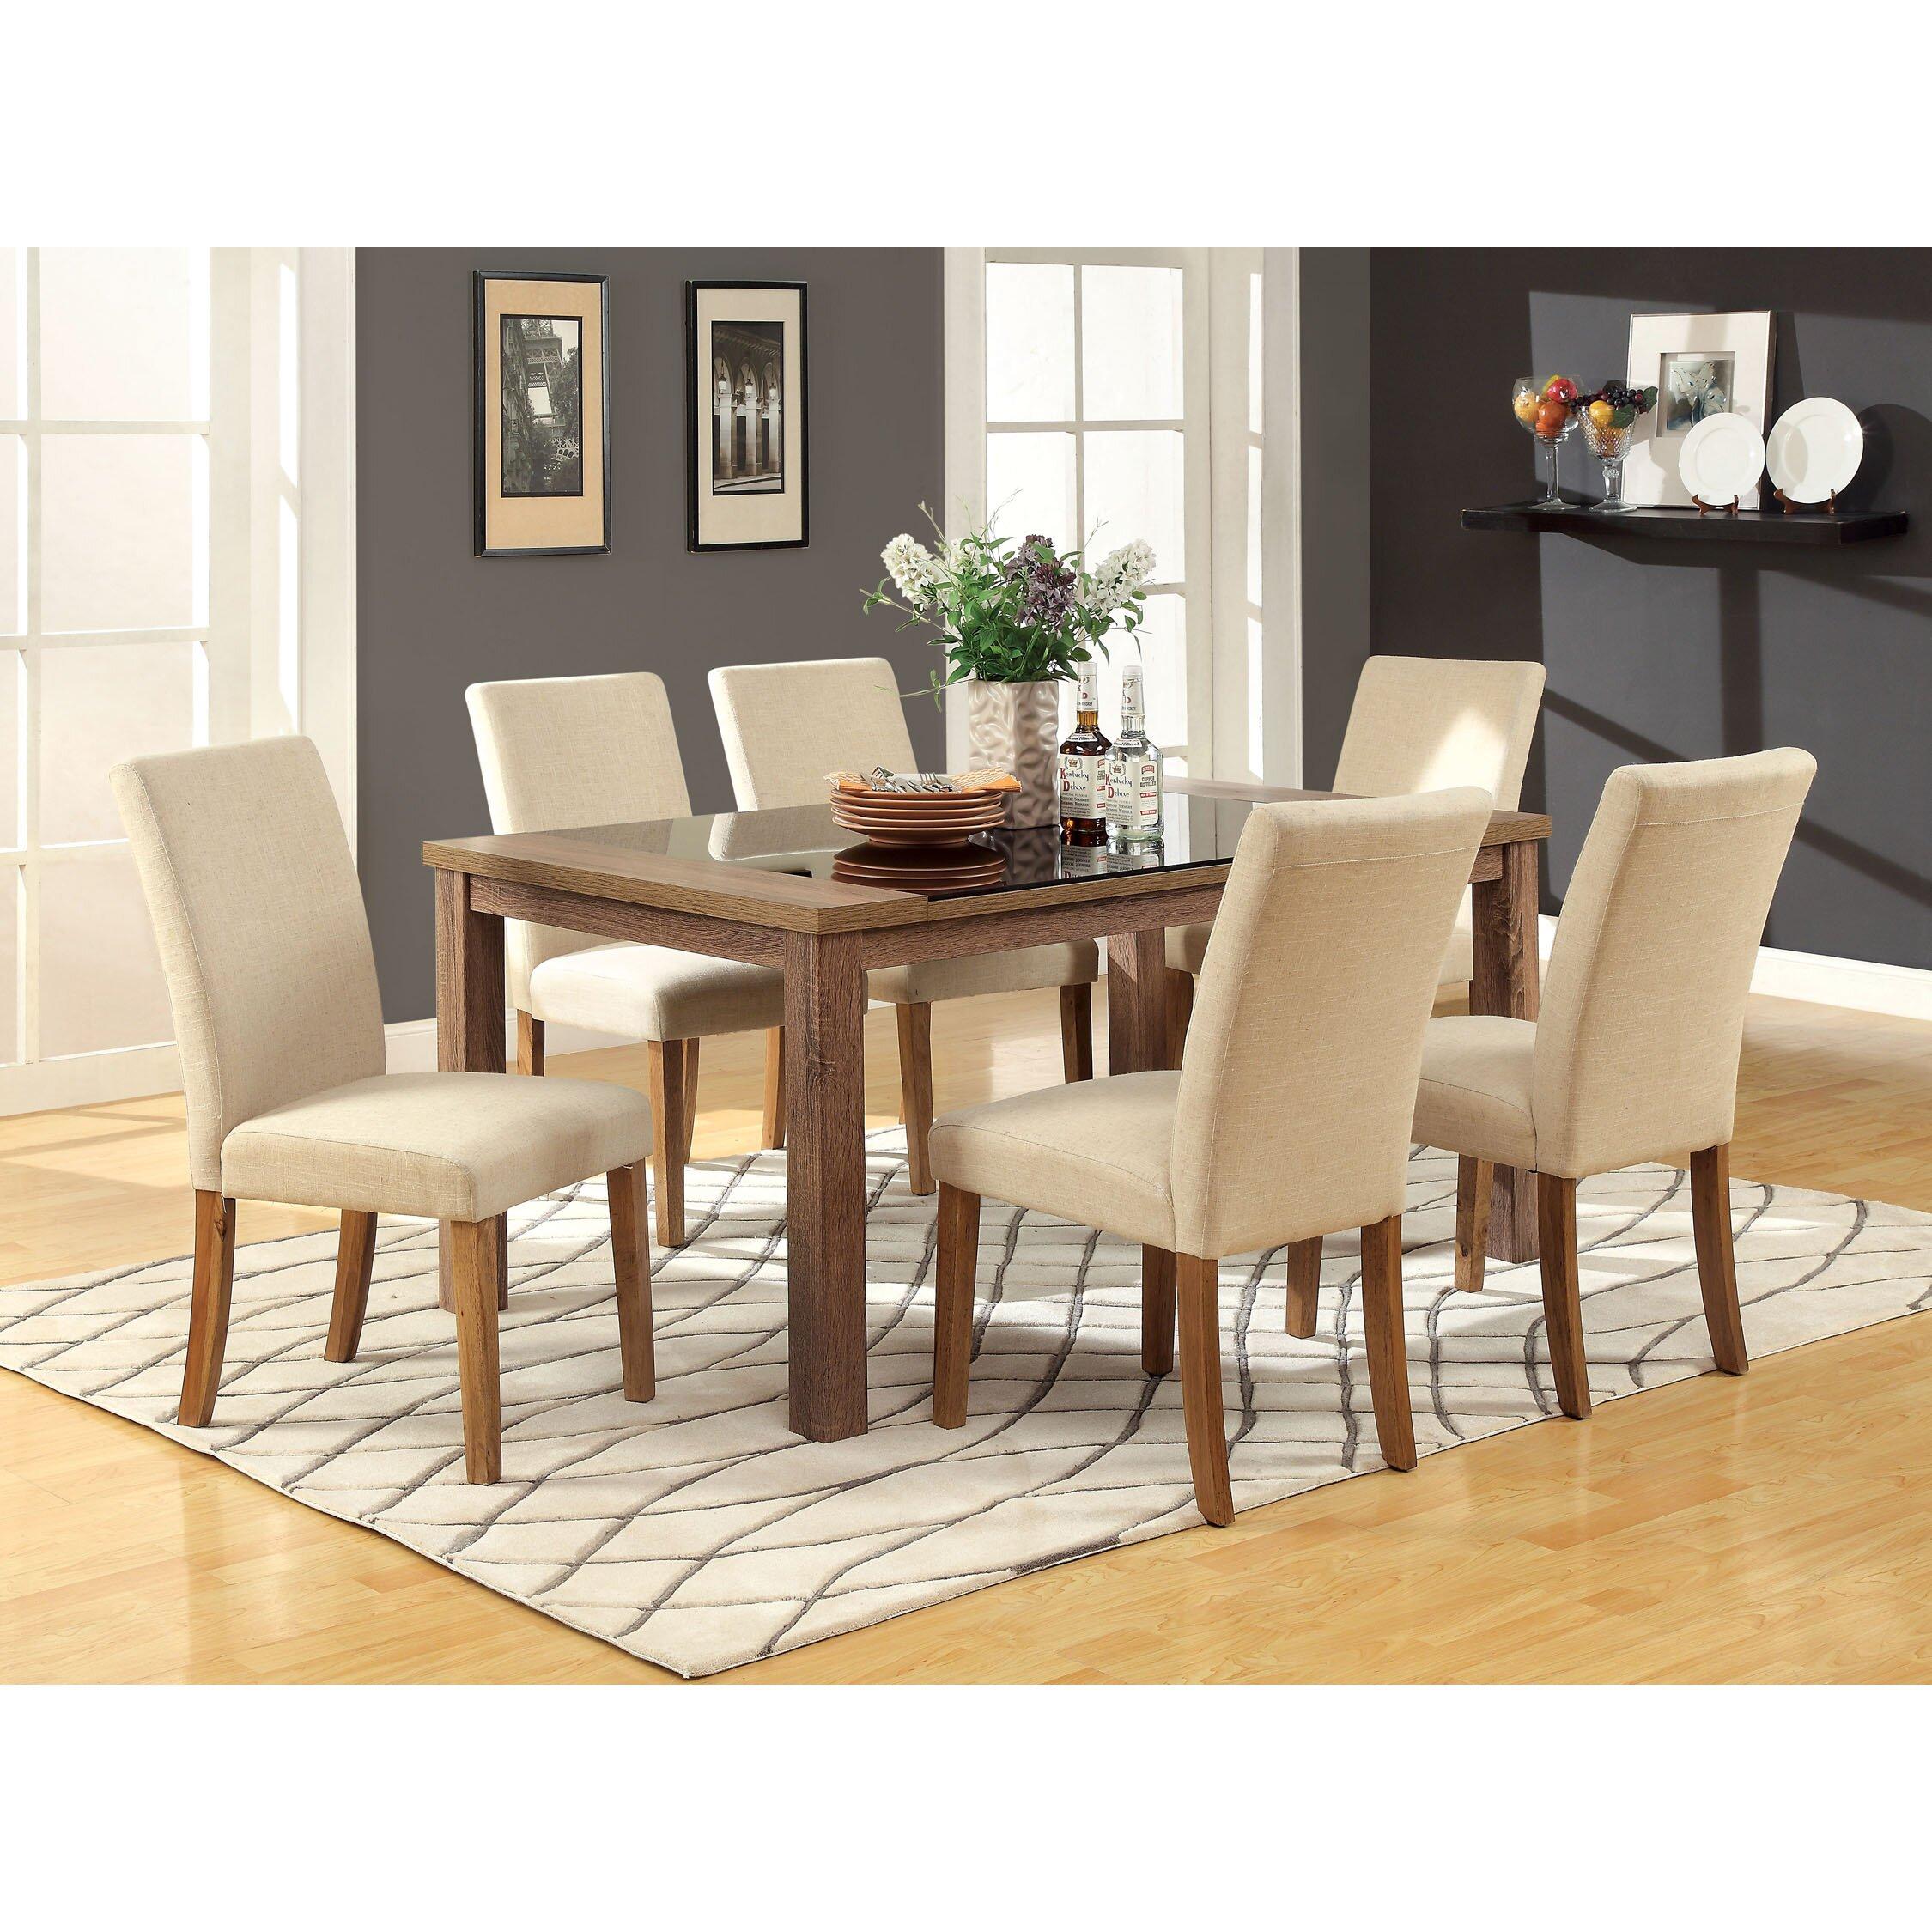 Hokku designs czareck dining table wayfair for Hokku designs dining room furniture